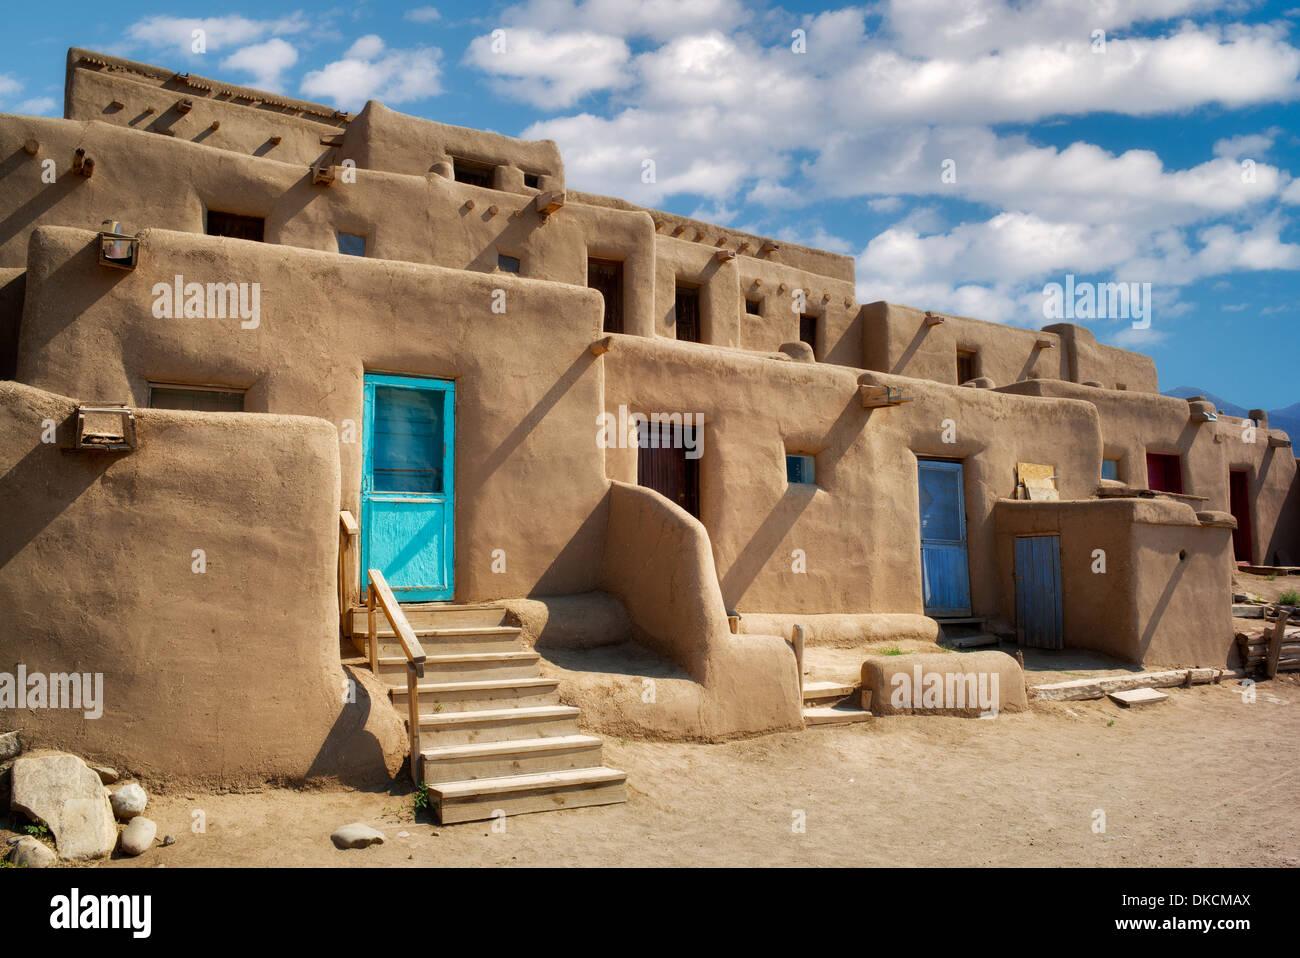 Strukturen in Taos Pueblo de Wohnung. Taos, New Mexico Stockbild